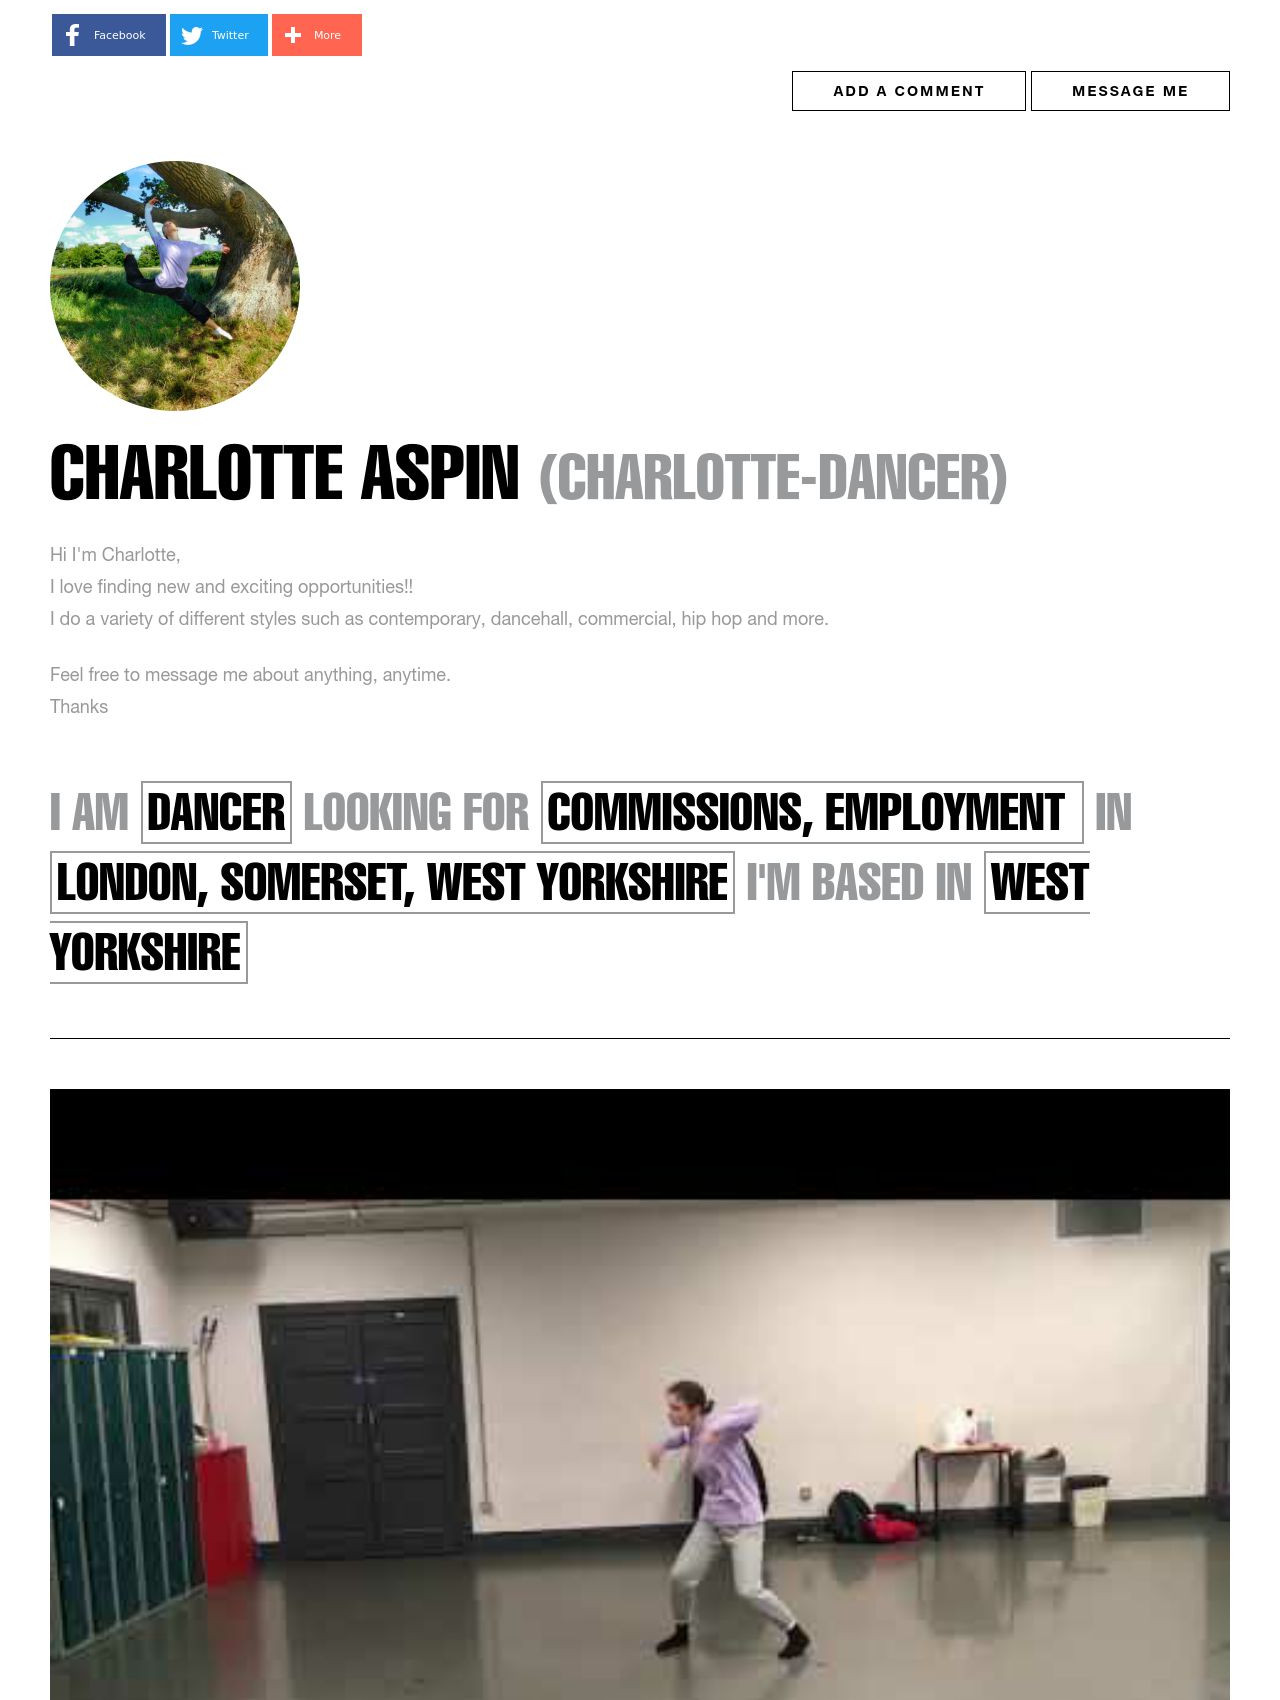 Charlotte Aspin